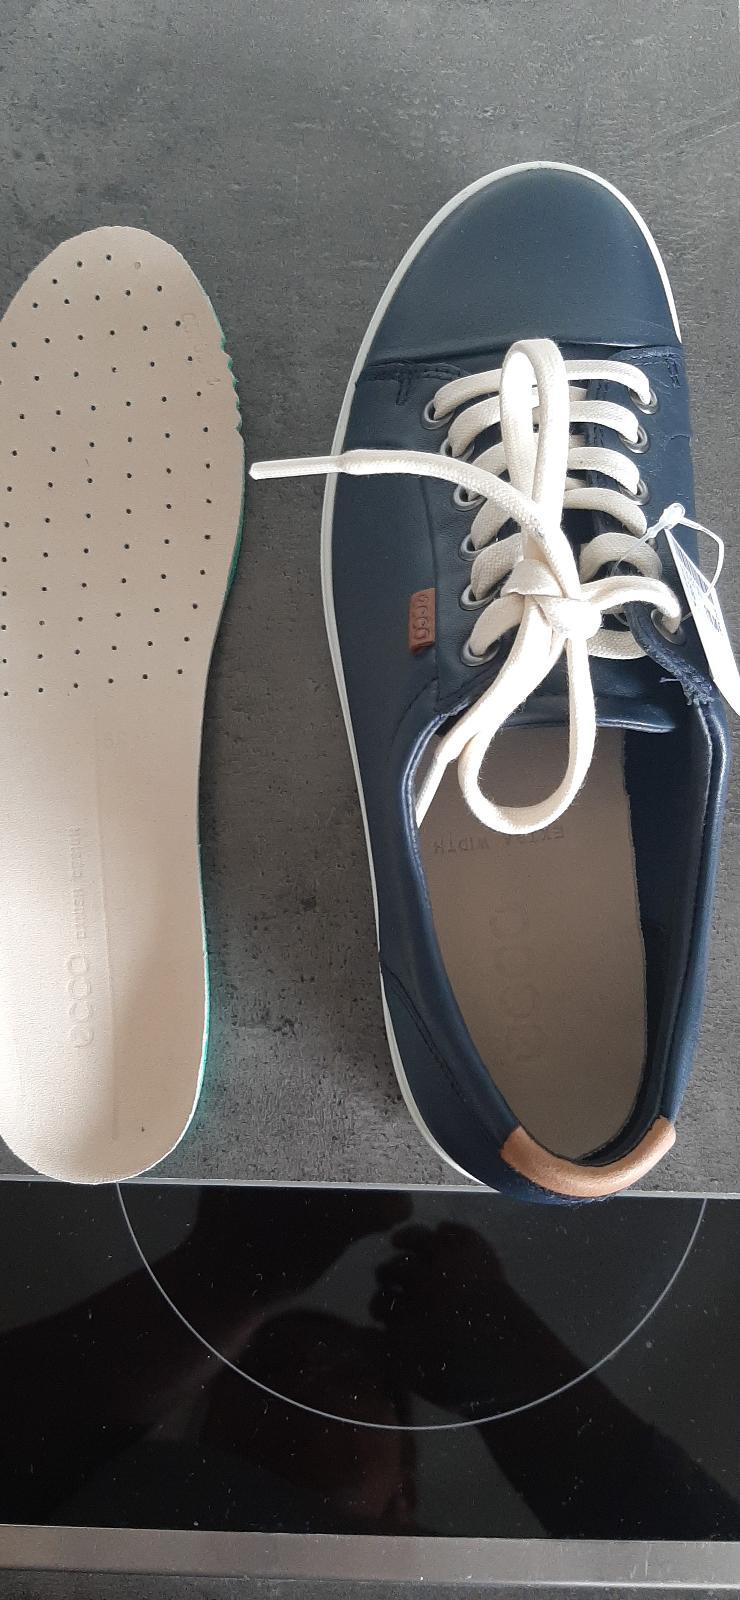 Sneaker Schuhe ecco links 39 rechts 40  dunkelblau Leder  Neu